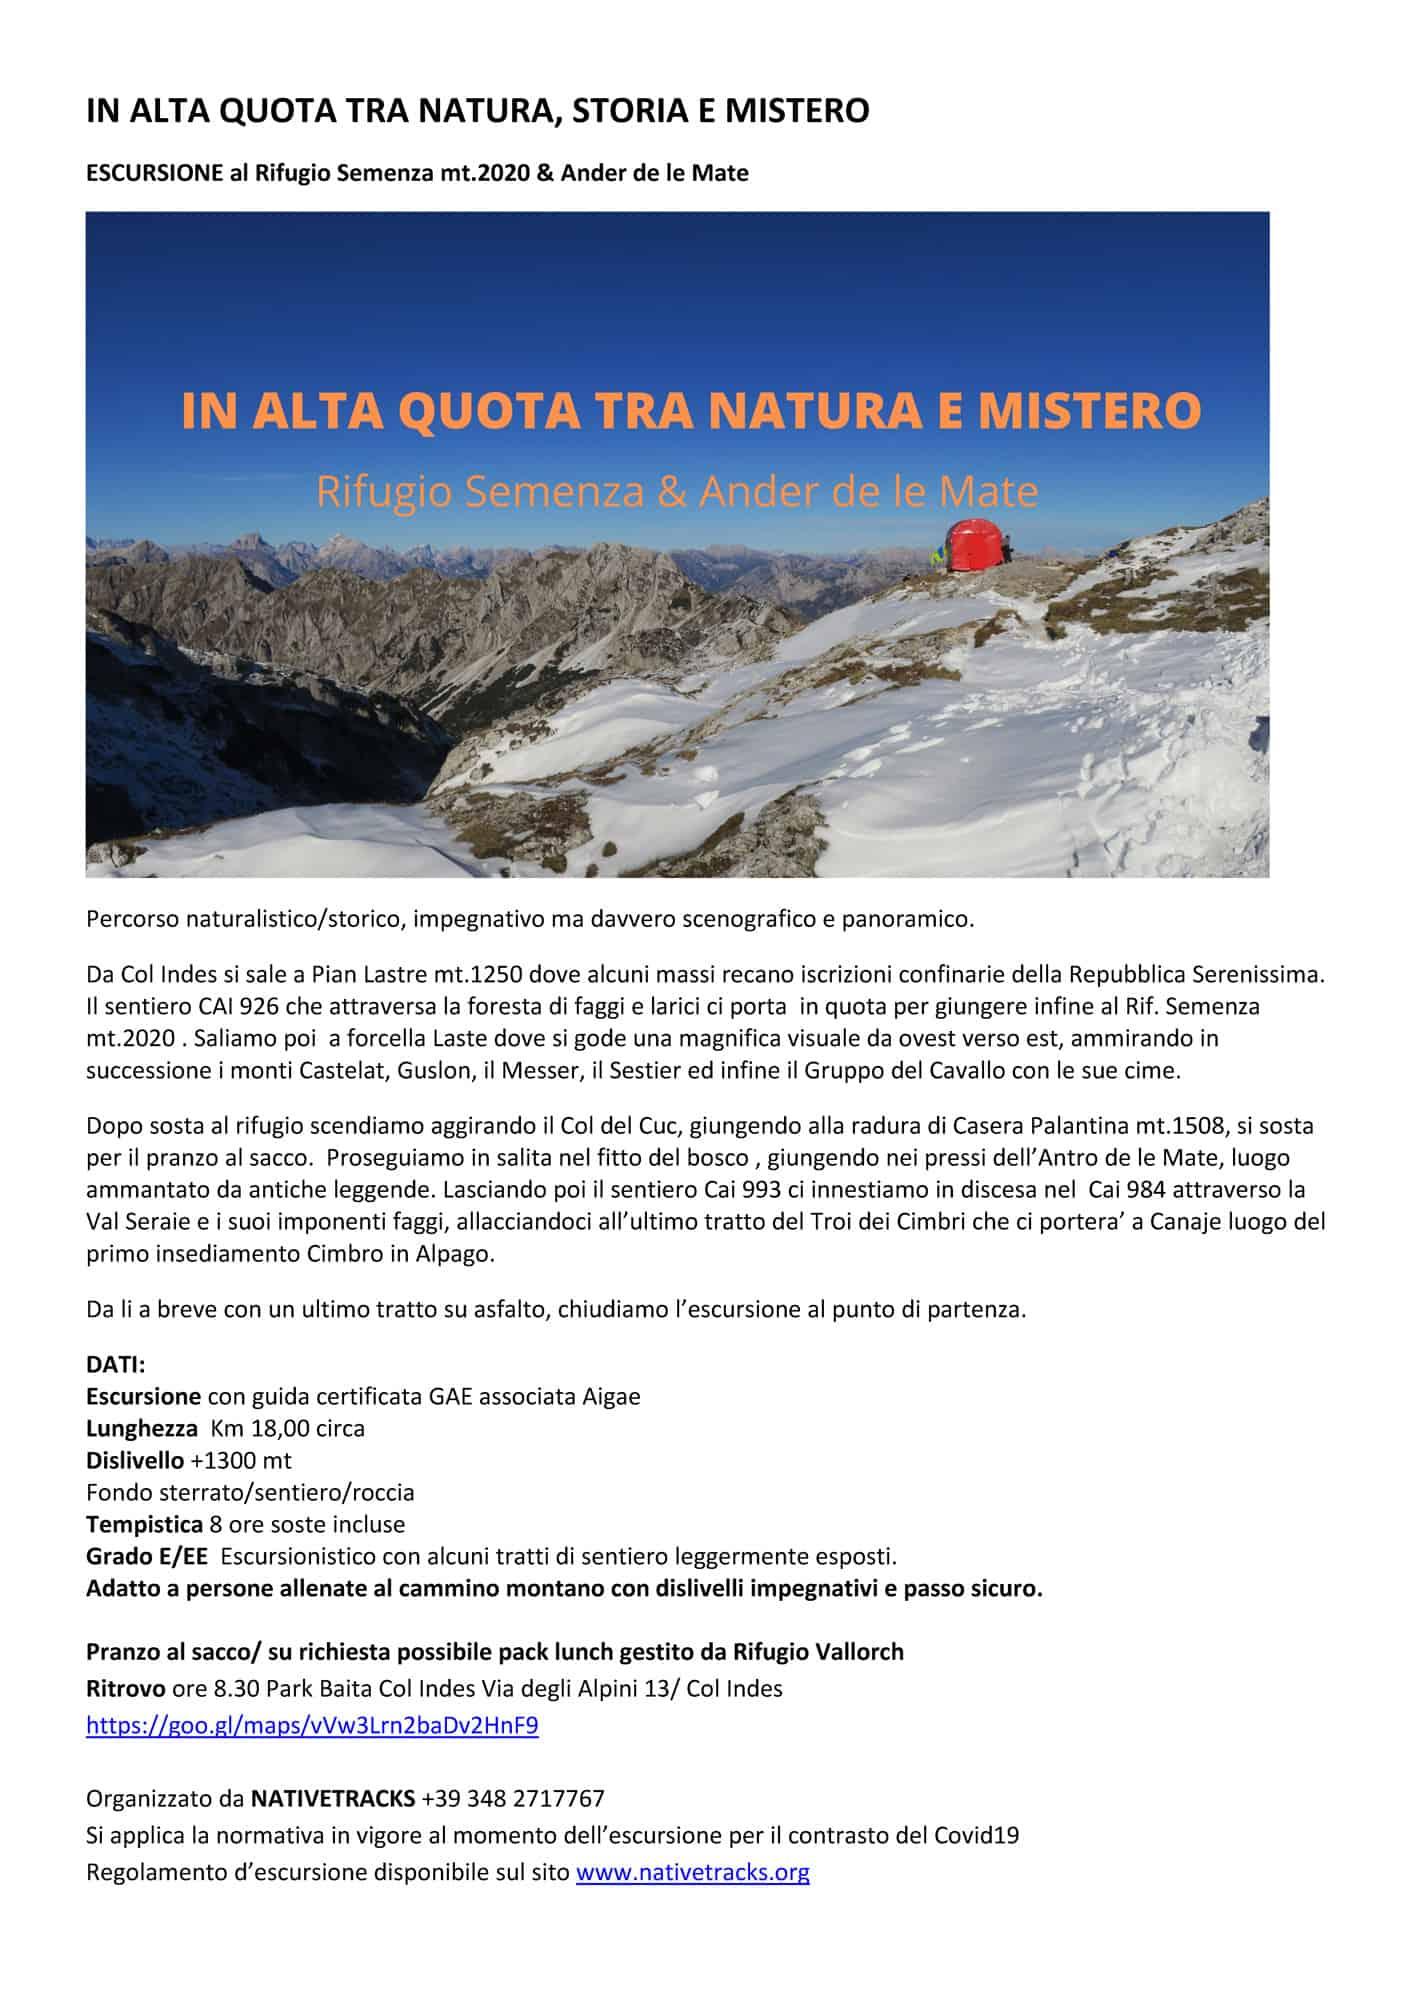 Trail-4-In-alta-quota_WEB